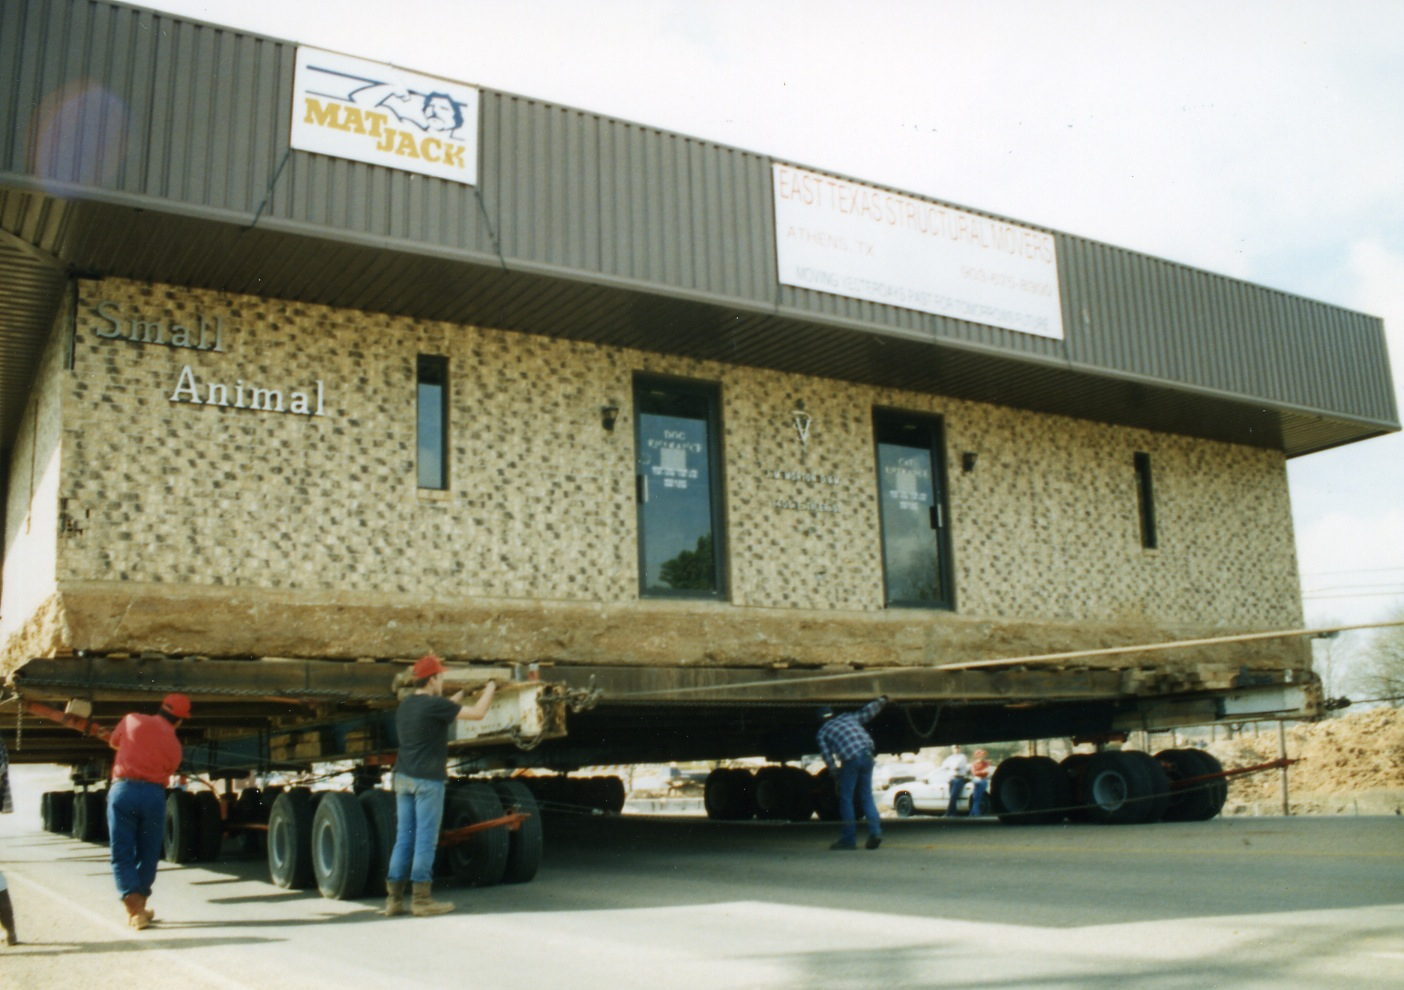 1995 #4 Vet Clinic NR Hills, TX